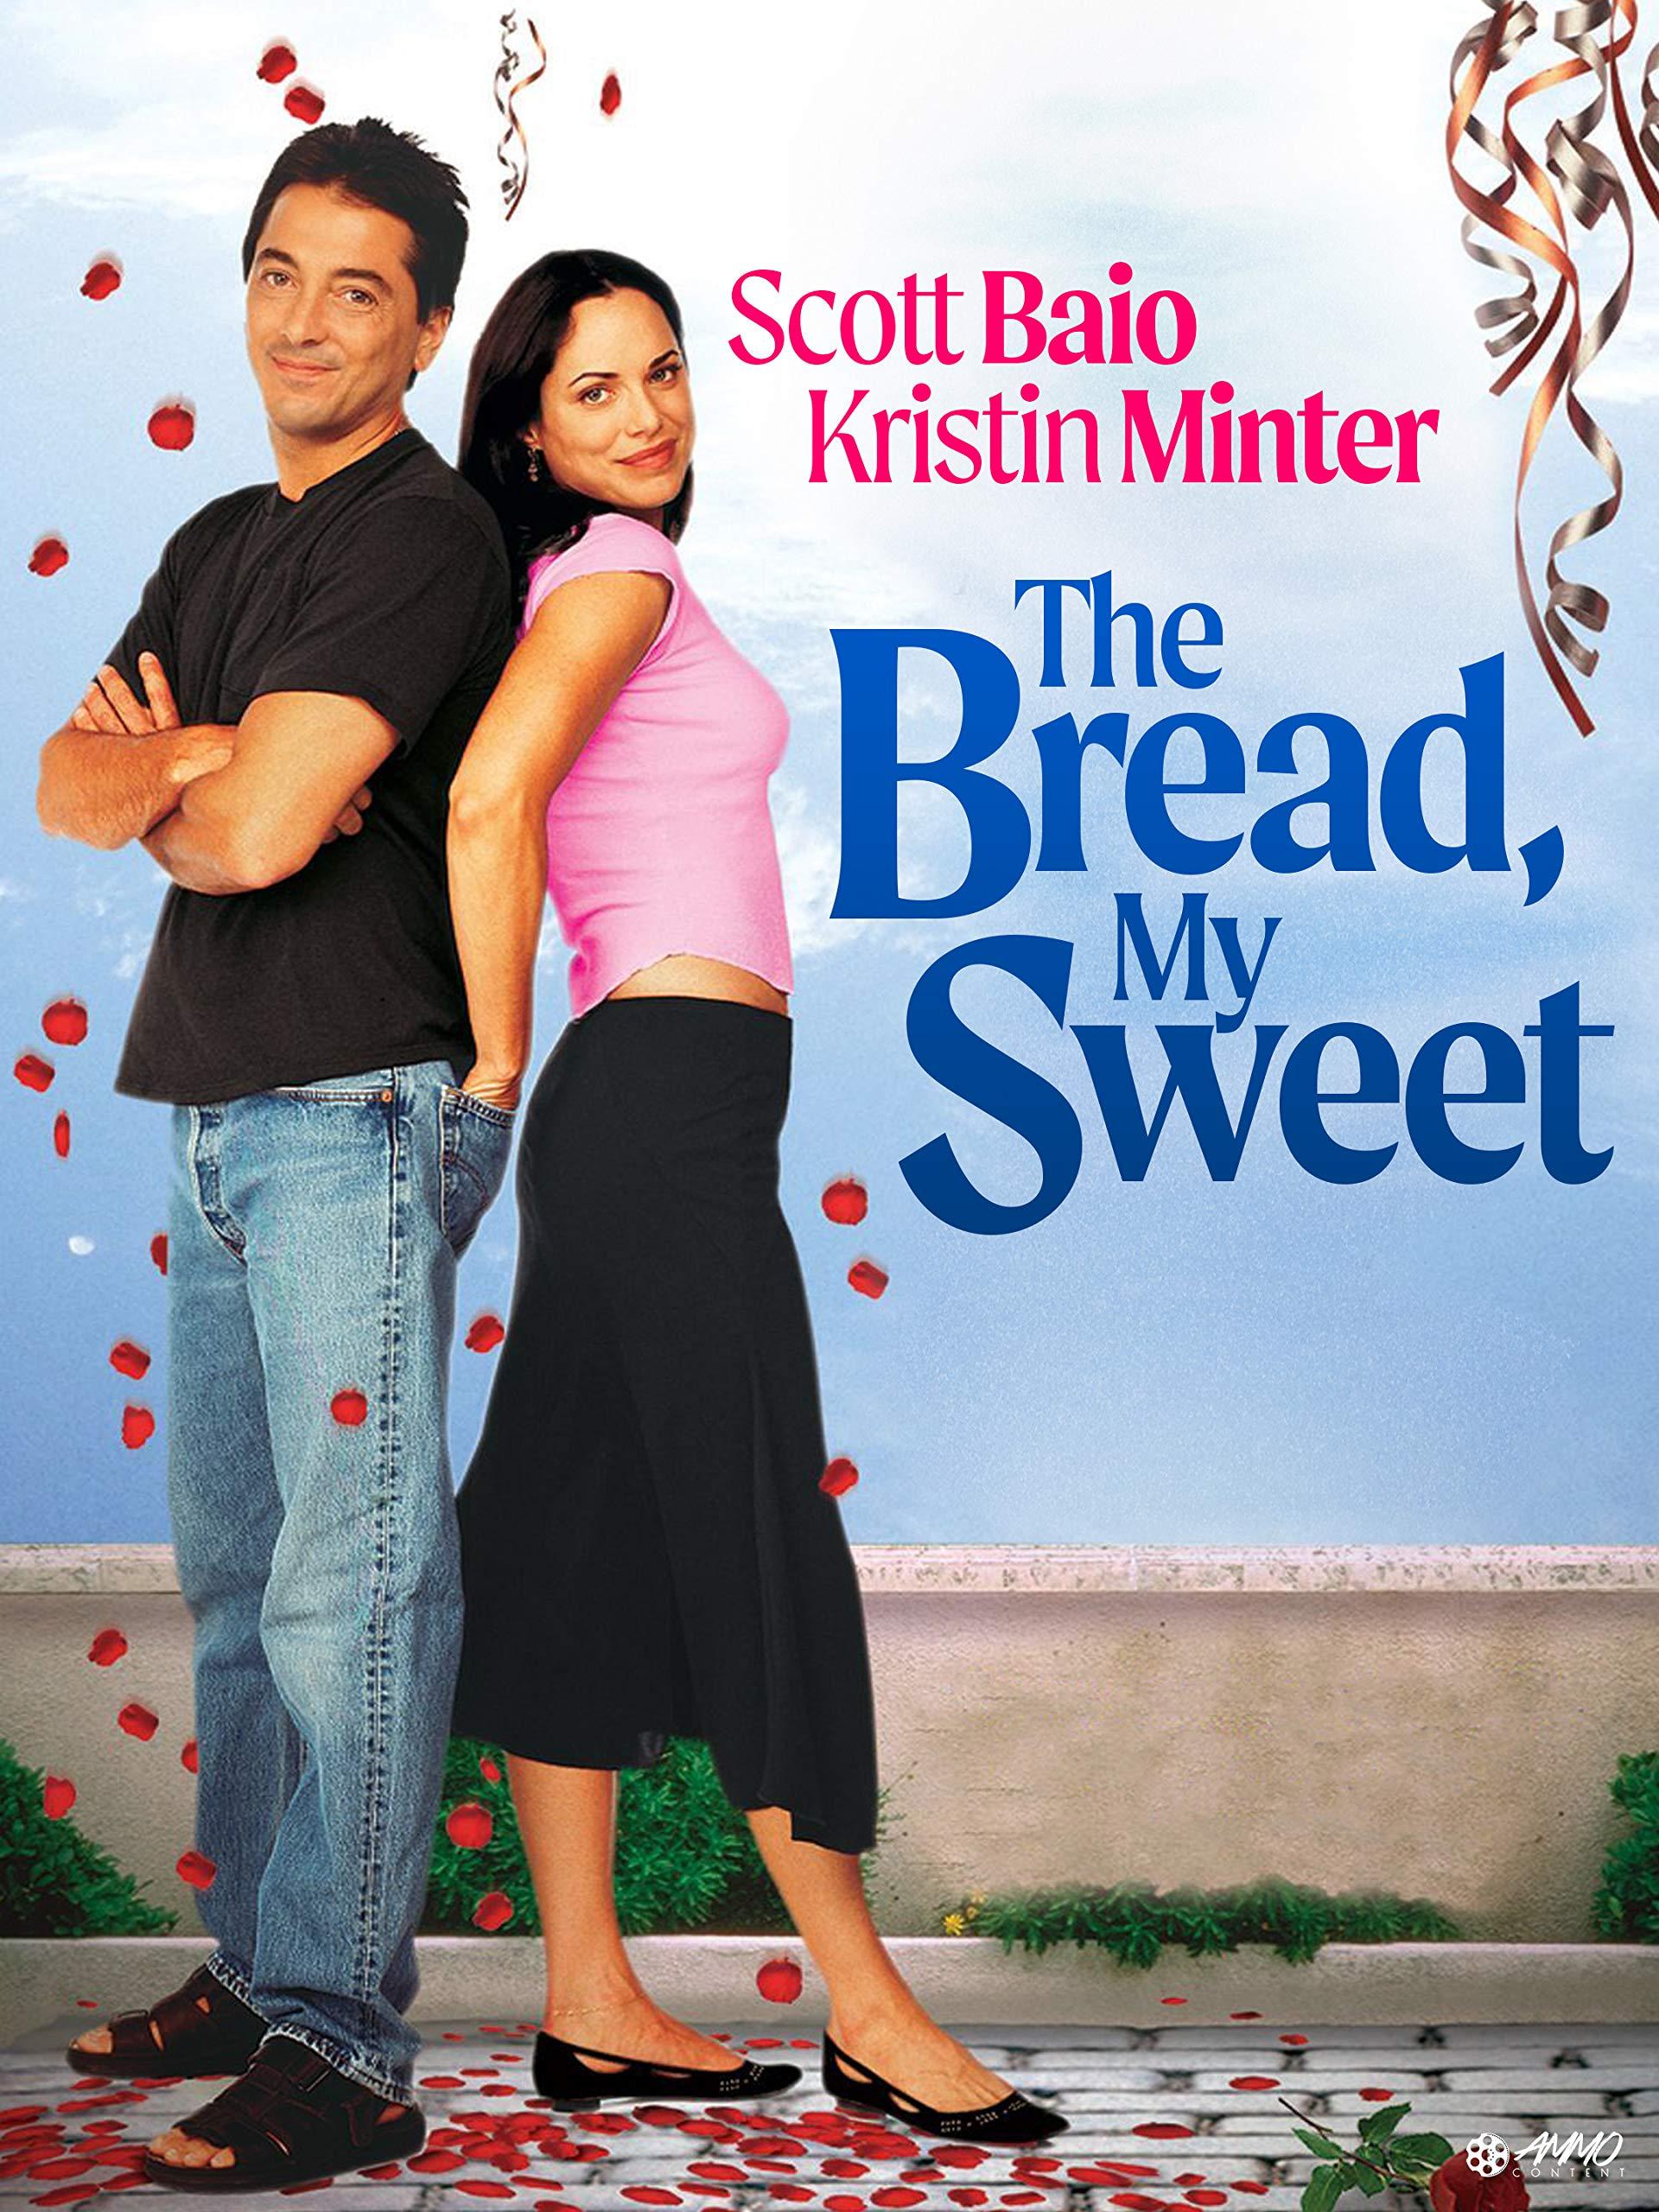 The Bread, My Sweet